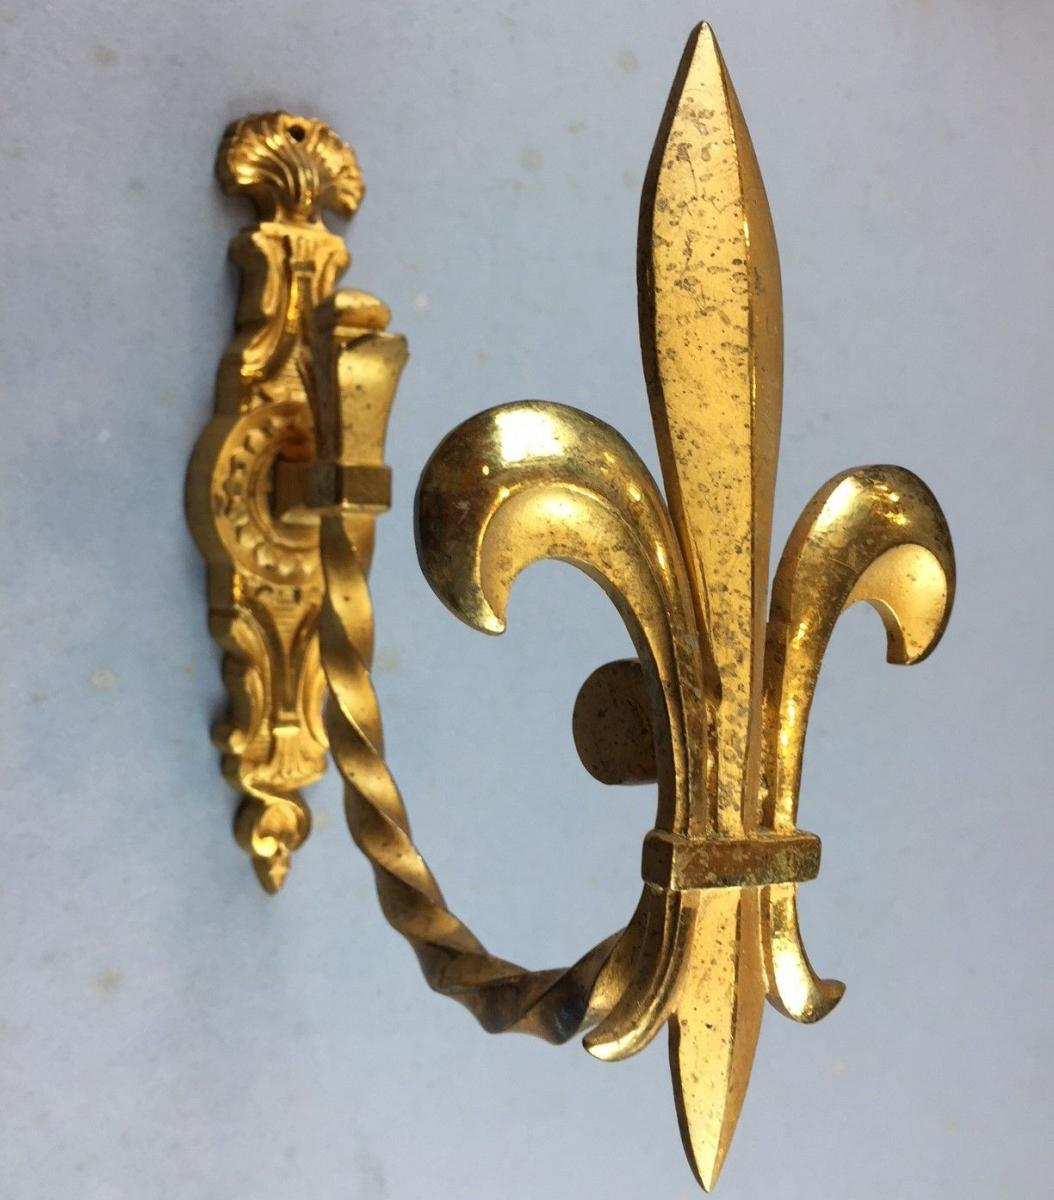 Antique Brass Drapery Curtain Tie Backs Fleur de Lis Antique Hardware Ormolu Window Treatment